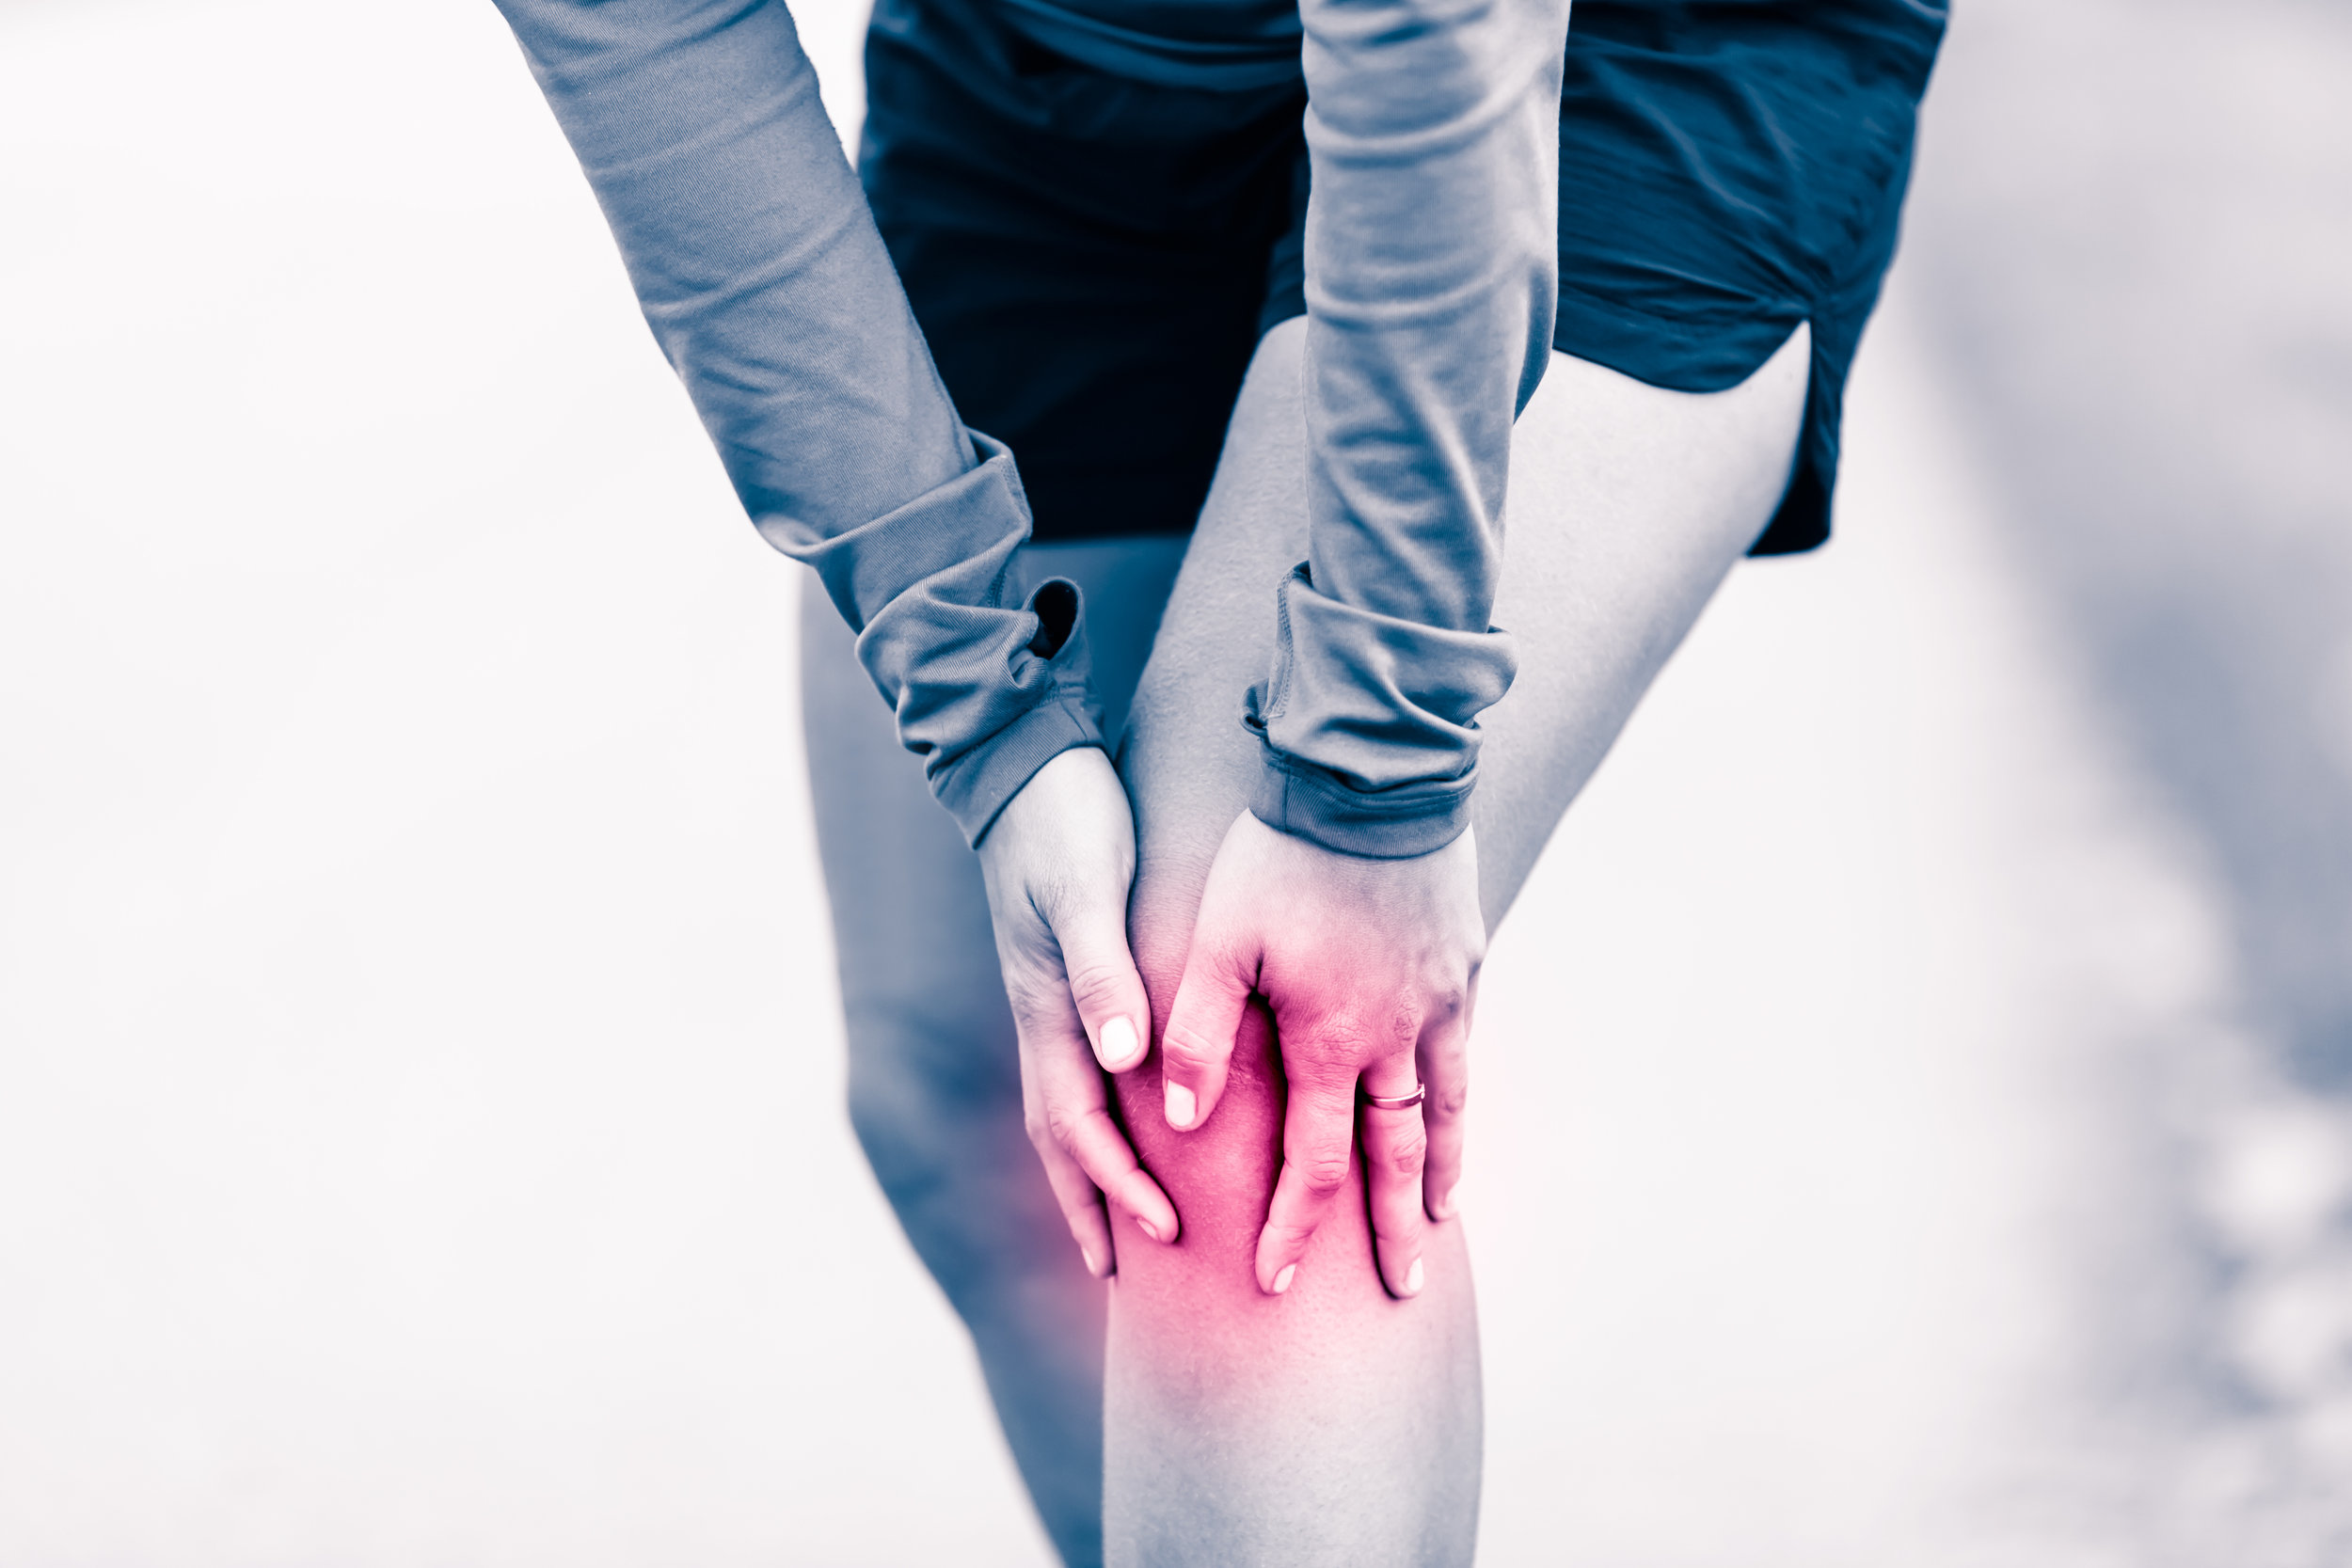 Knee-Pain-Woman-Holding-Sore.jpg